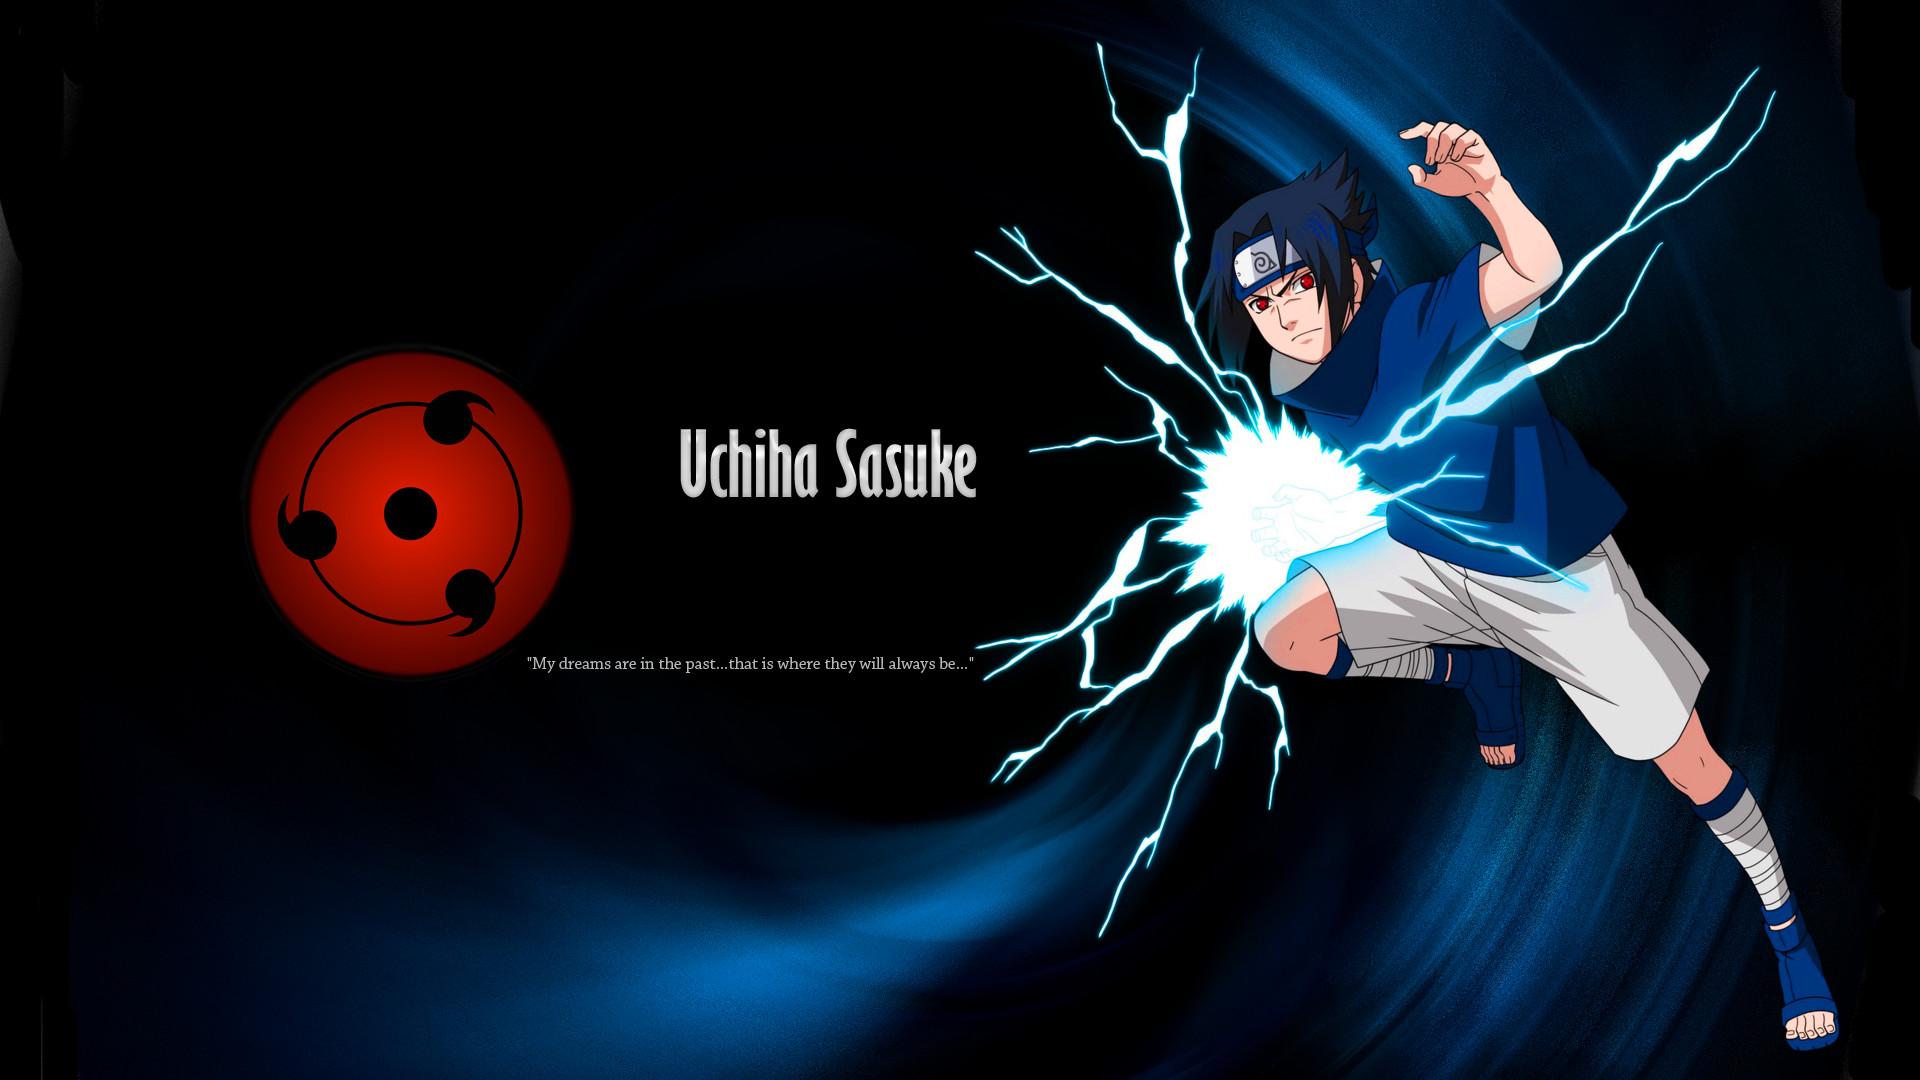 Collection of Sasuke Uchiha Wallpaper on HDWallpapers Wallpaper Sasuke  Wallpapers)